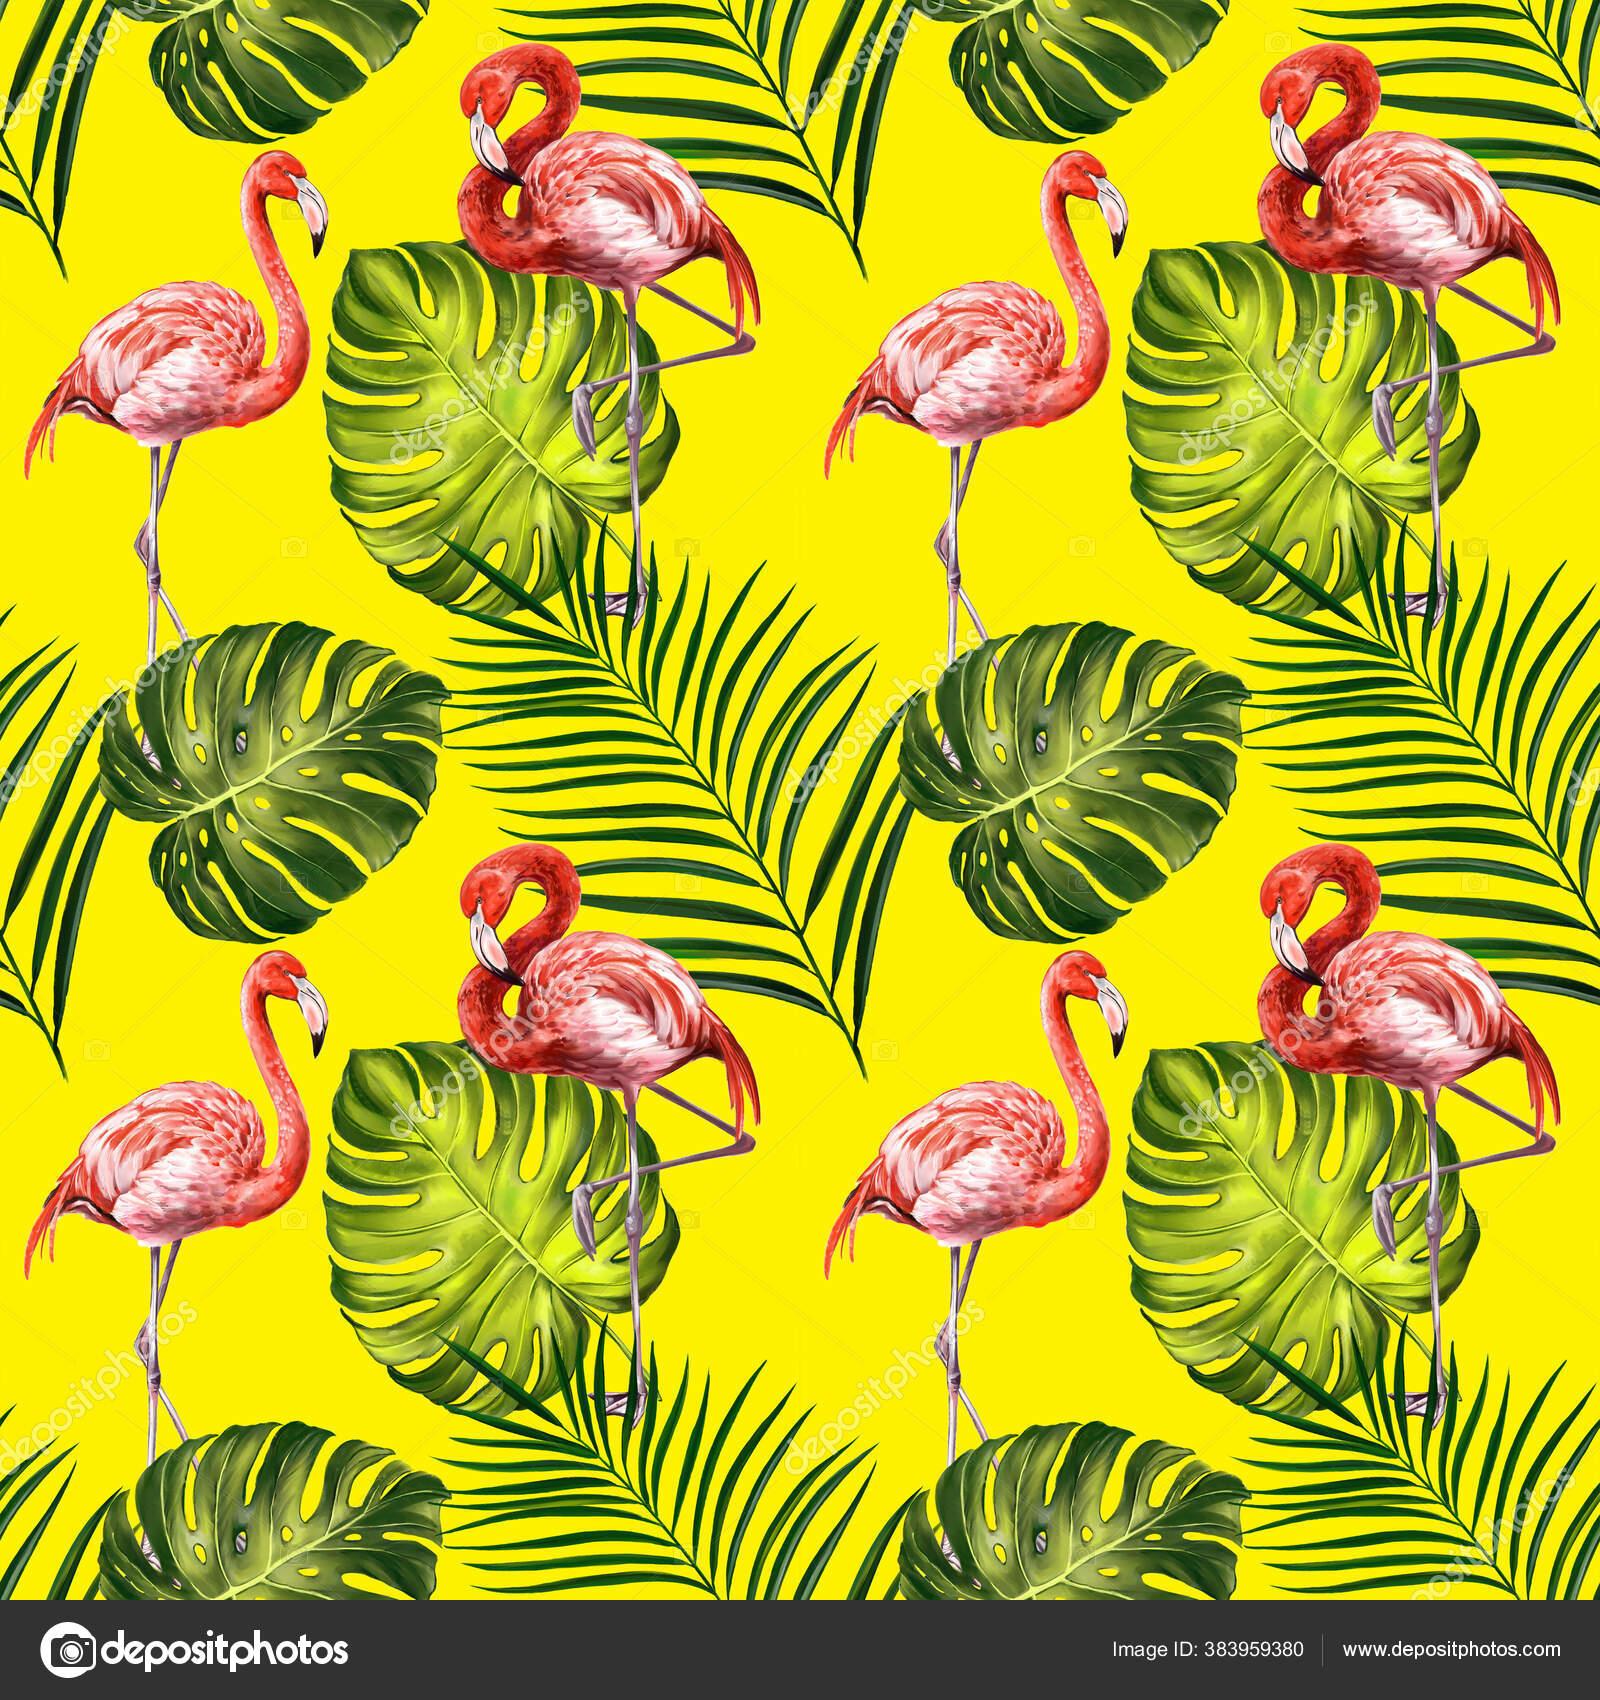 depositphotos 383959380 stock photo flamingos with tropical leaves beautiful